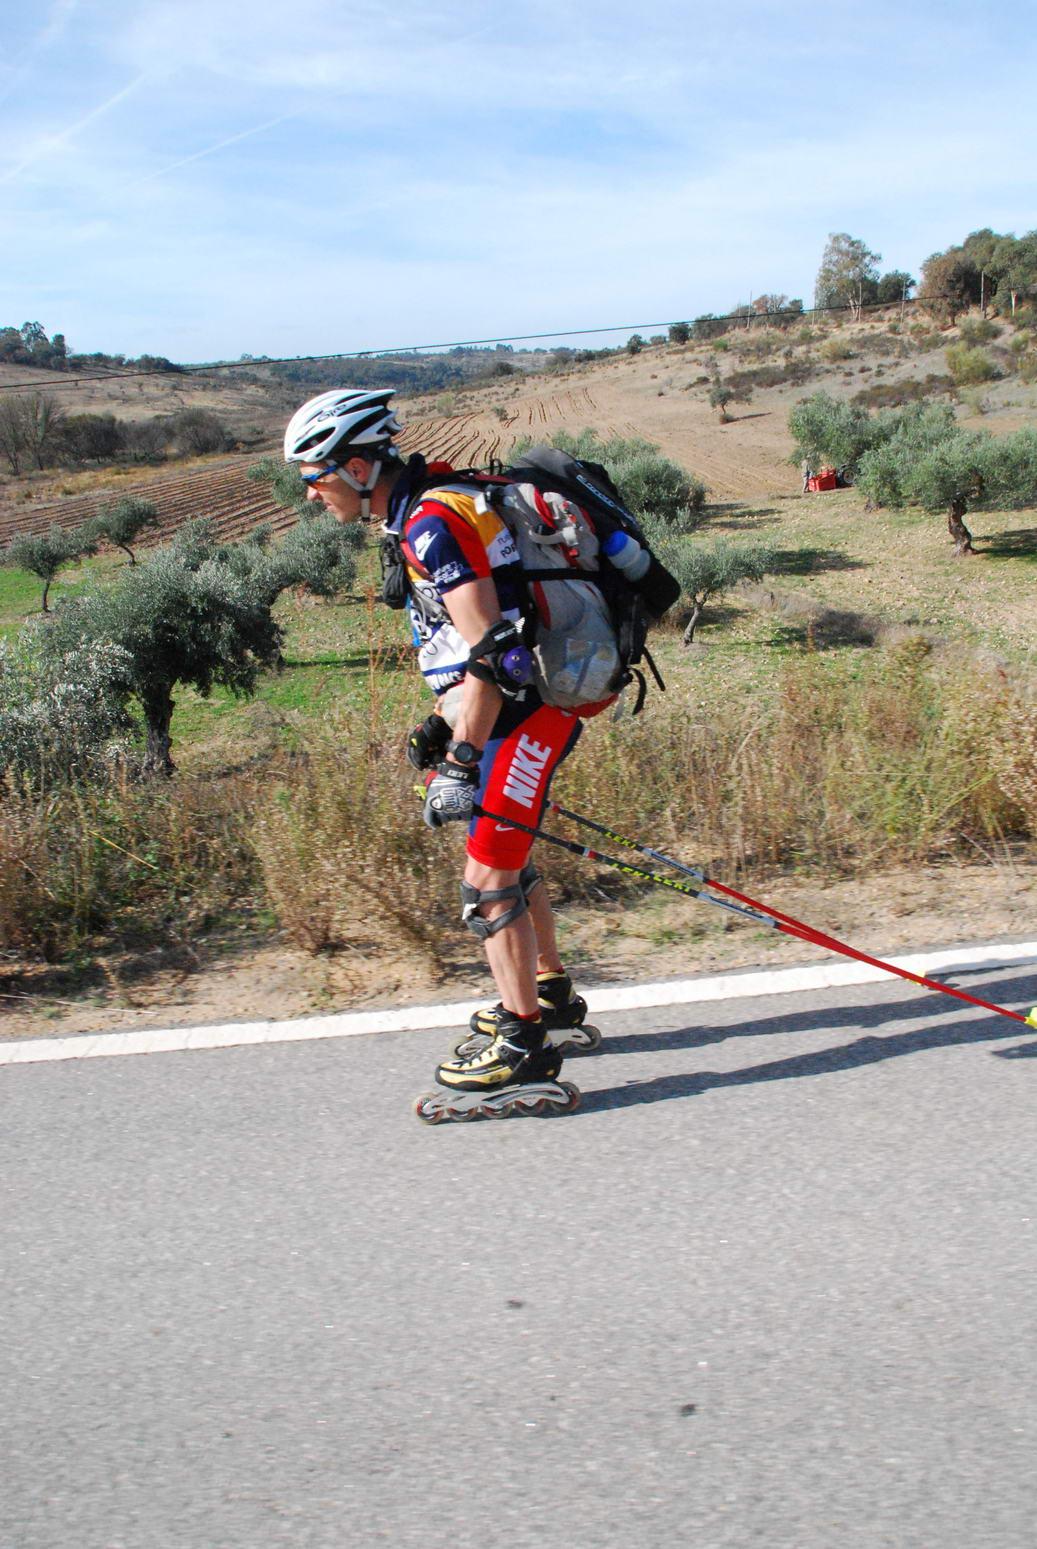 Chris descends on the skates (Portugal ARWC 2009)